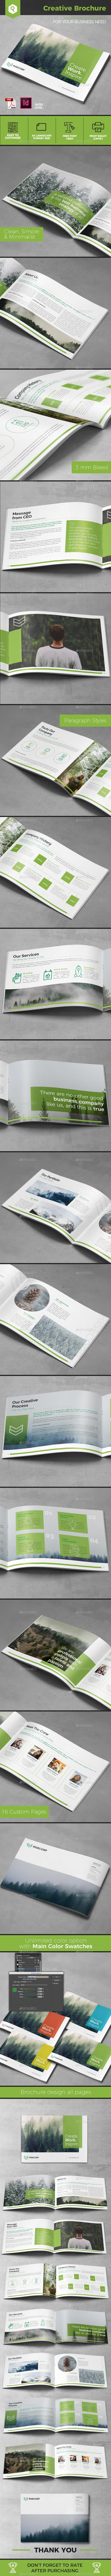 Creative Brochure Vol. 22 - A4 Landscape - Corporate Brochures